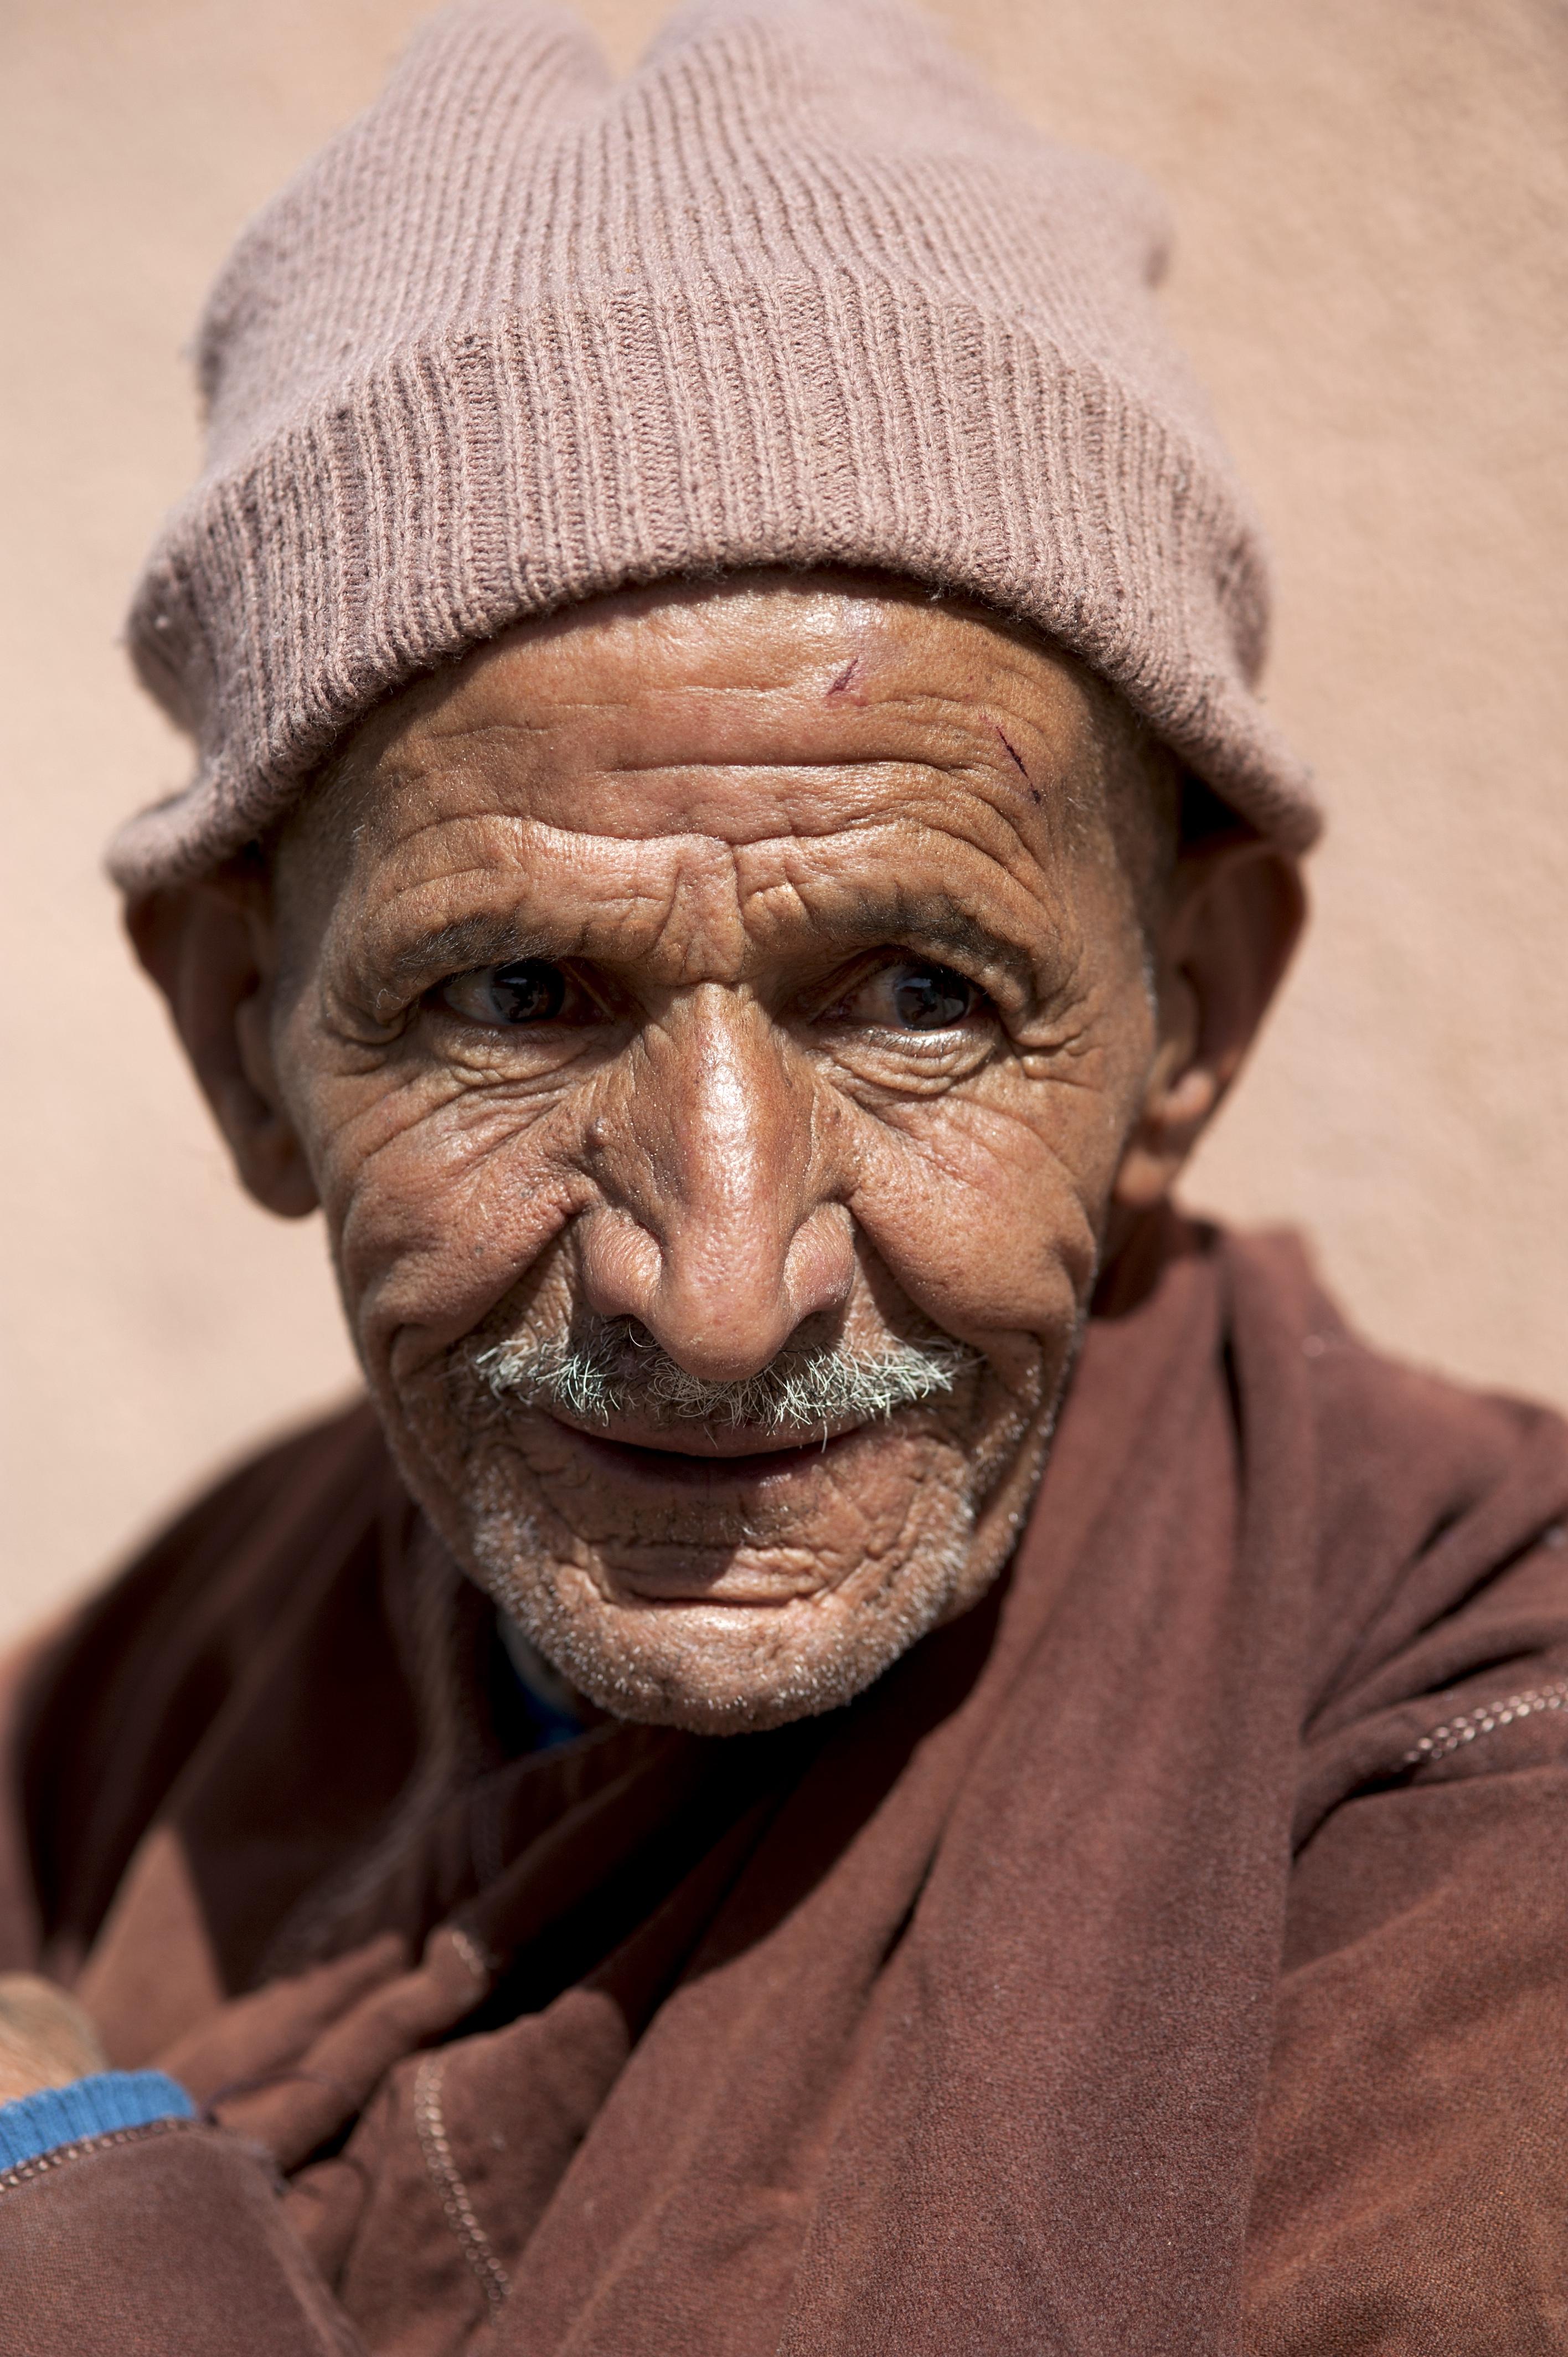 Blind man in Berber village, Atlas Mountains